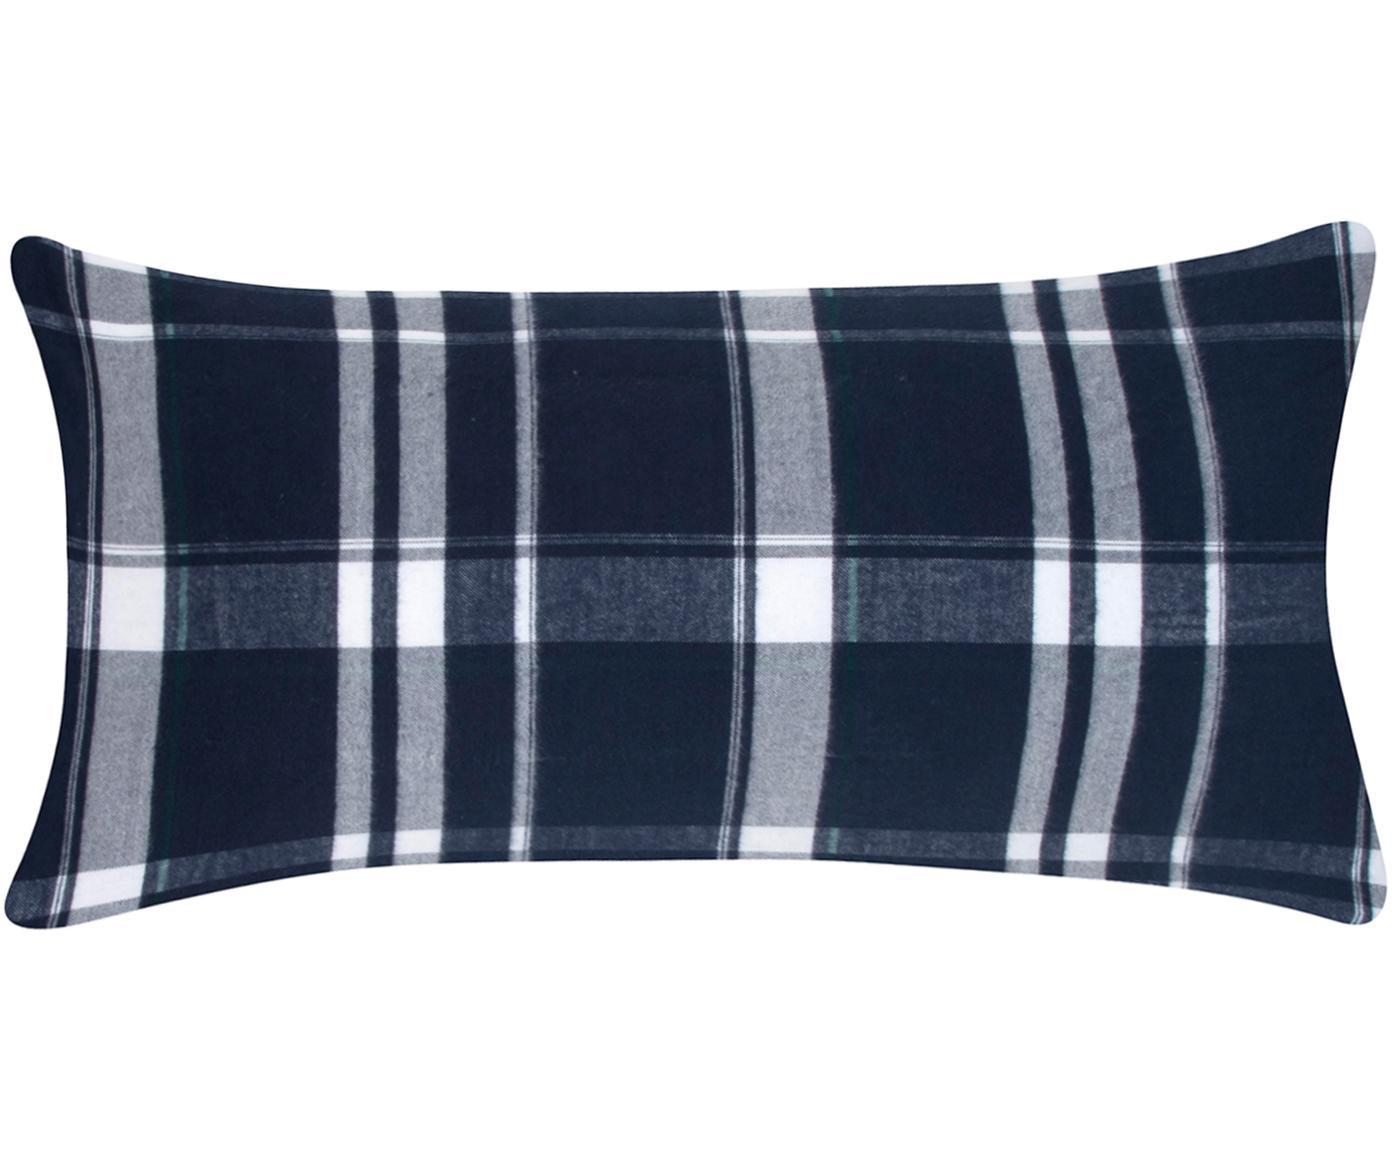 Flanell-Kissenbezüge Rolf, kariert, 2 Stück, Webart: Flanell Flanell ist ein s, Blau, 40 x 80 cm